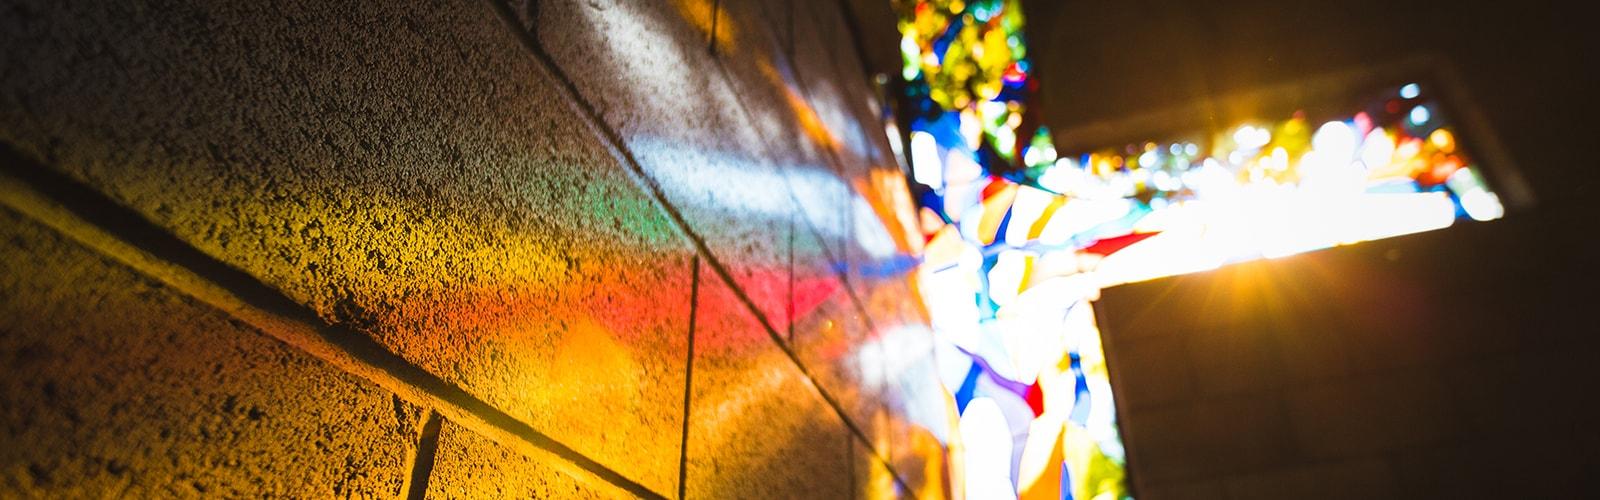 Glass-Fuller-Theological-Seminary